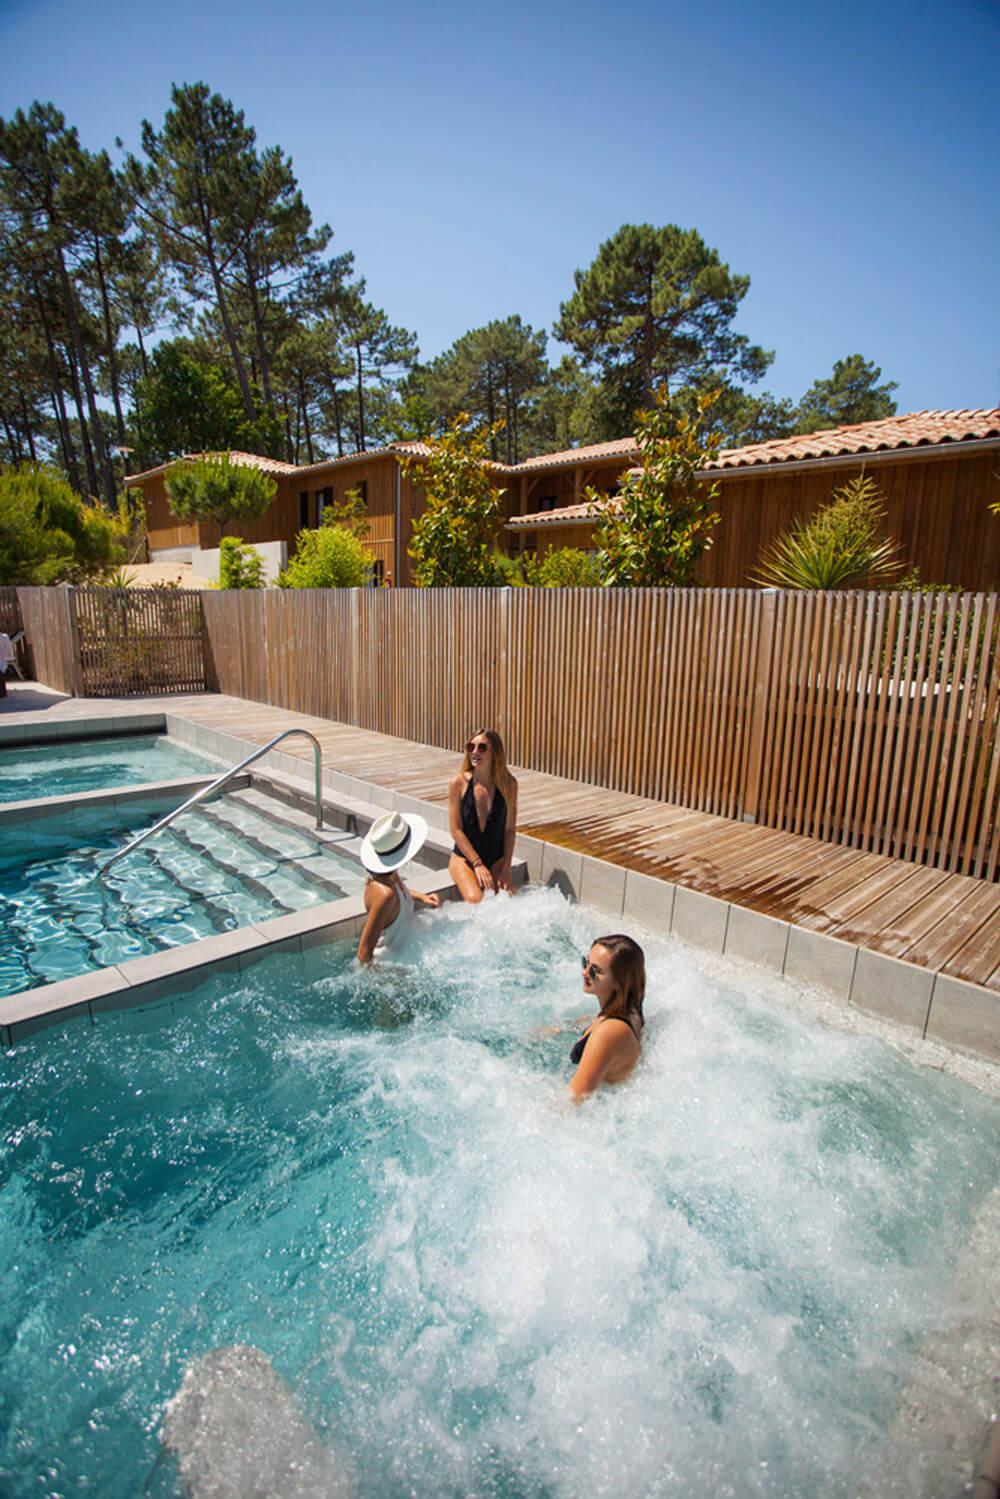 Domaine Ferret thalasso relaxation piscine exterieure